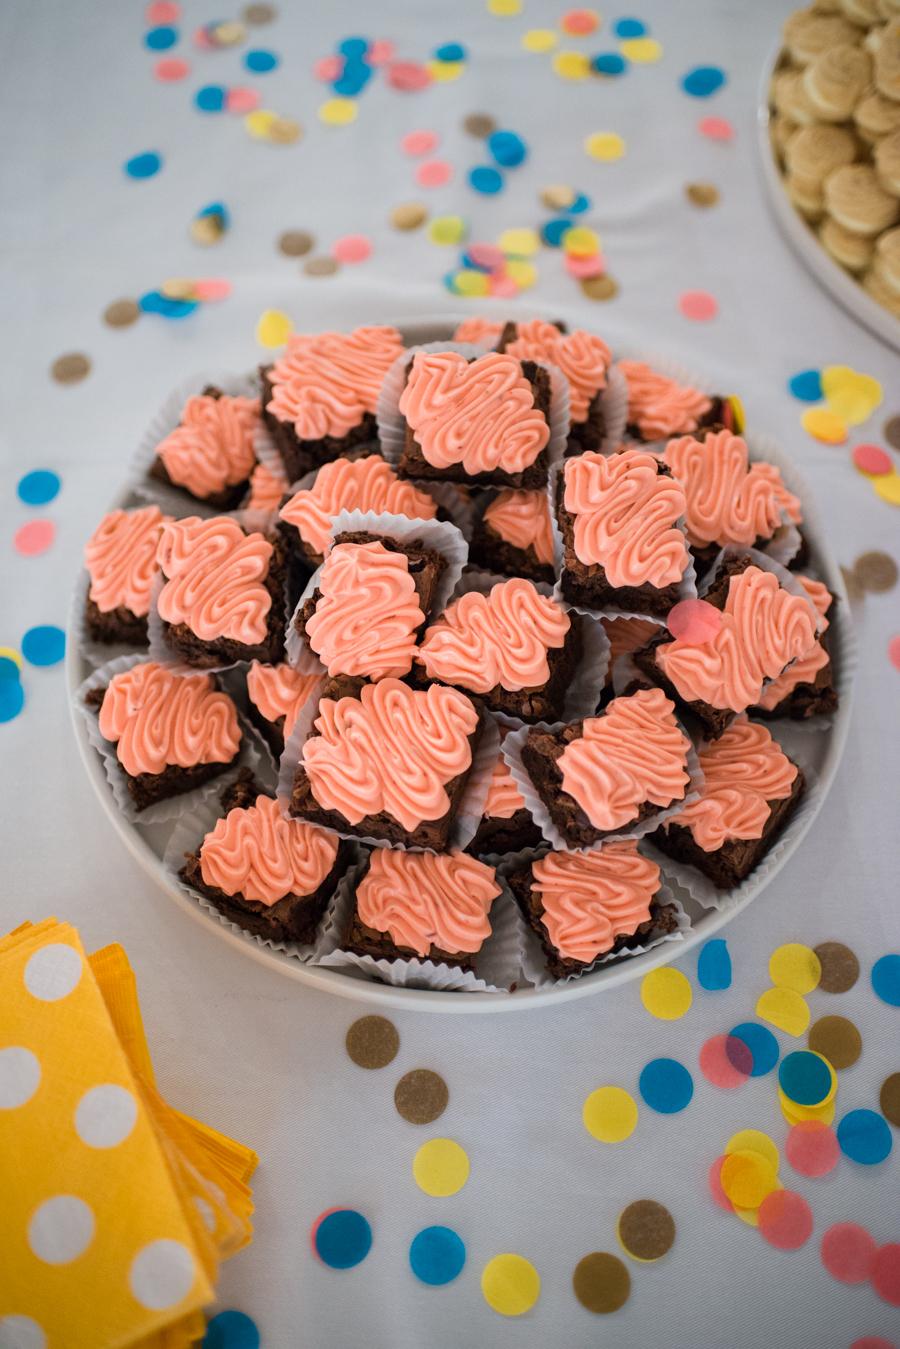 Chocolate brownies with fresh strawberry icing. Yes, please! #meetandmake